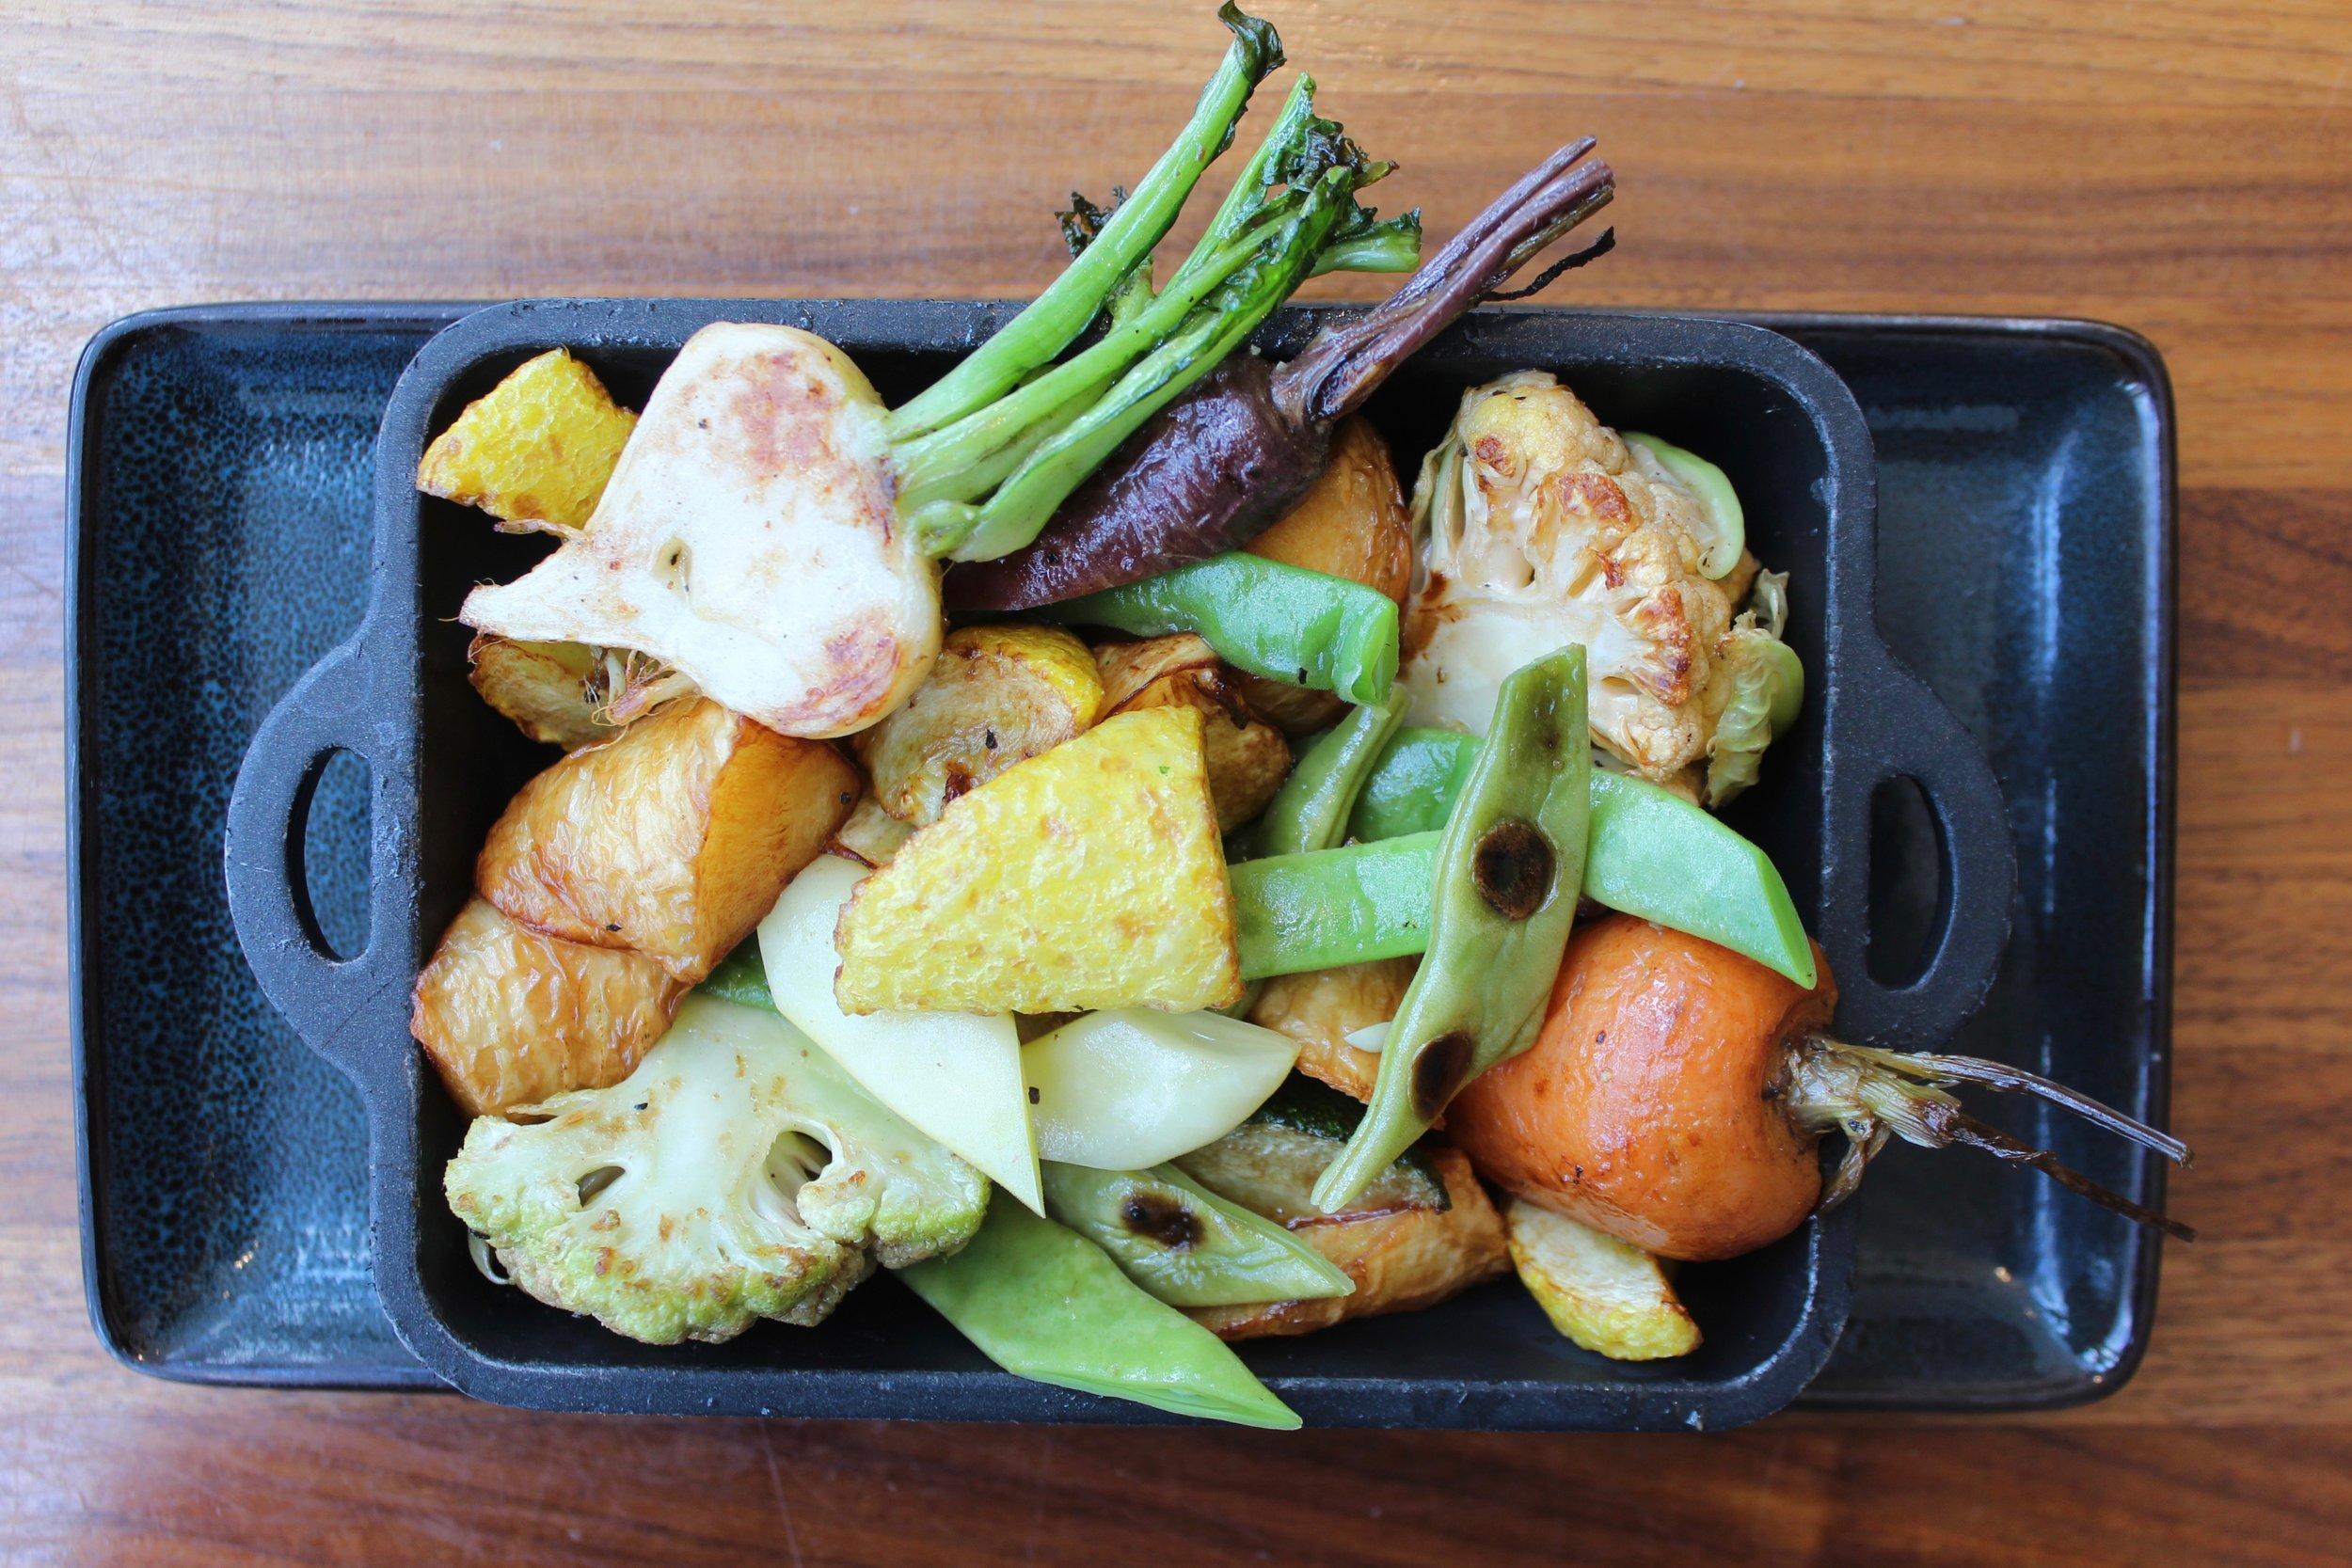 The Chef's Garden Vegetables